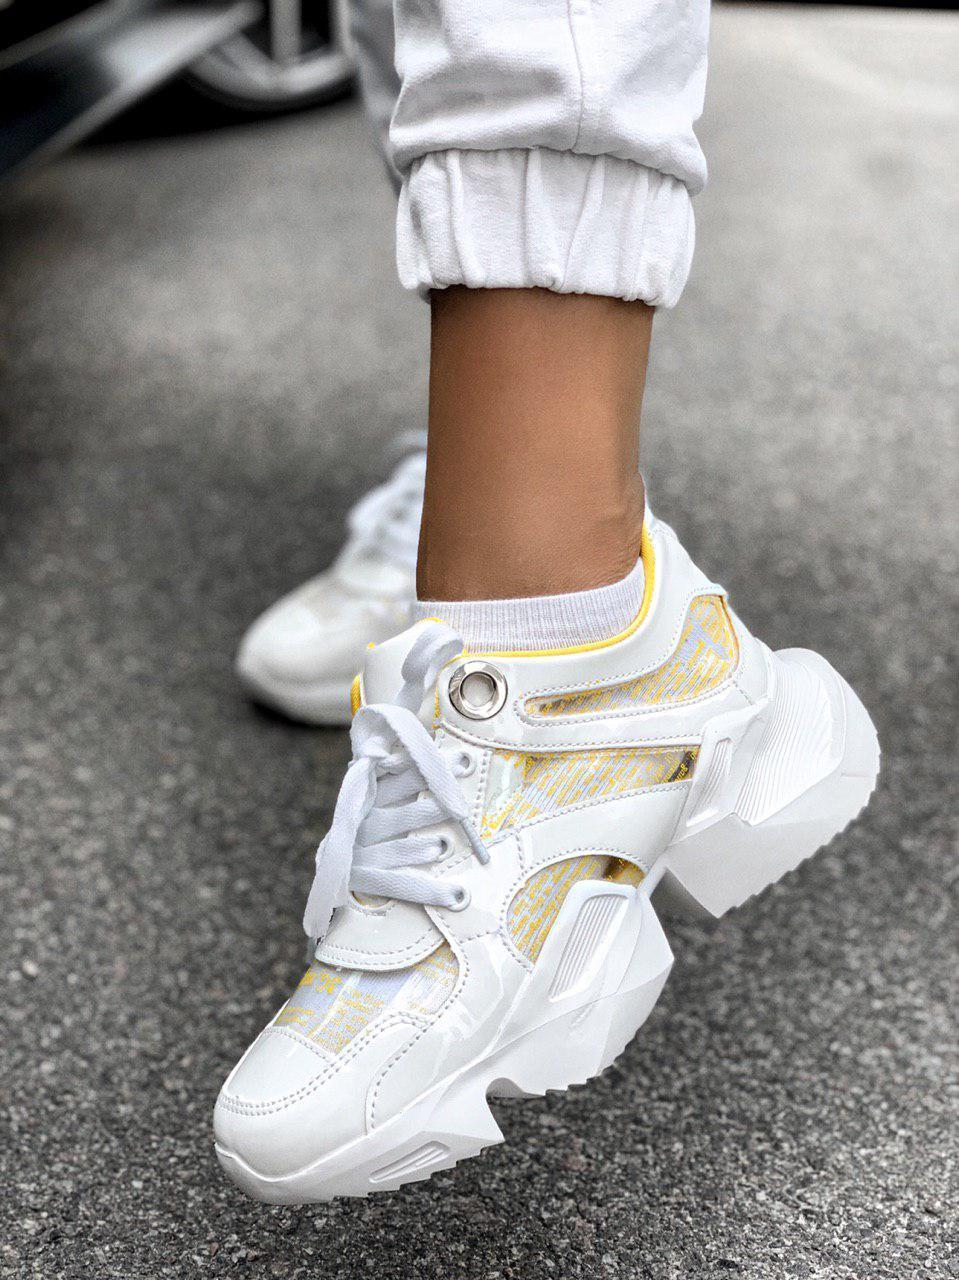 Женские кроссовки MJ-6589-3 white/yellow